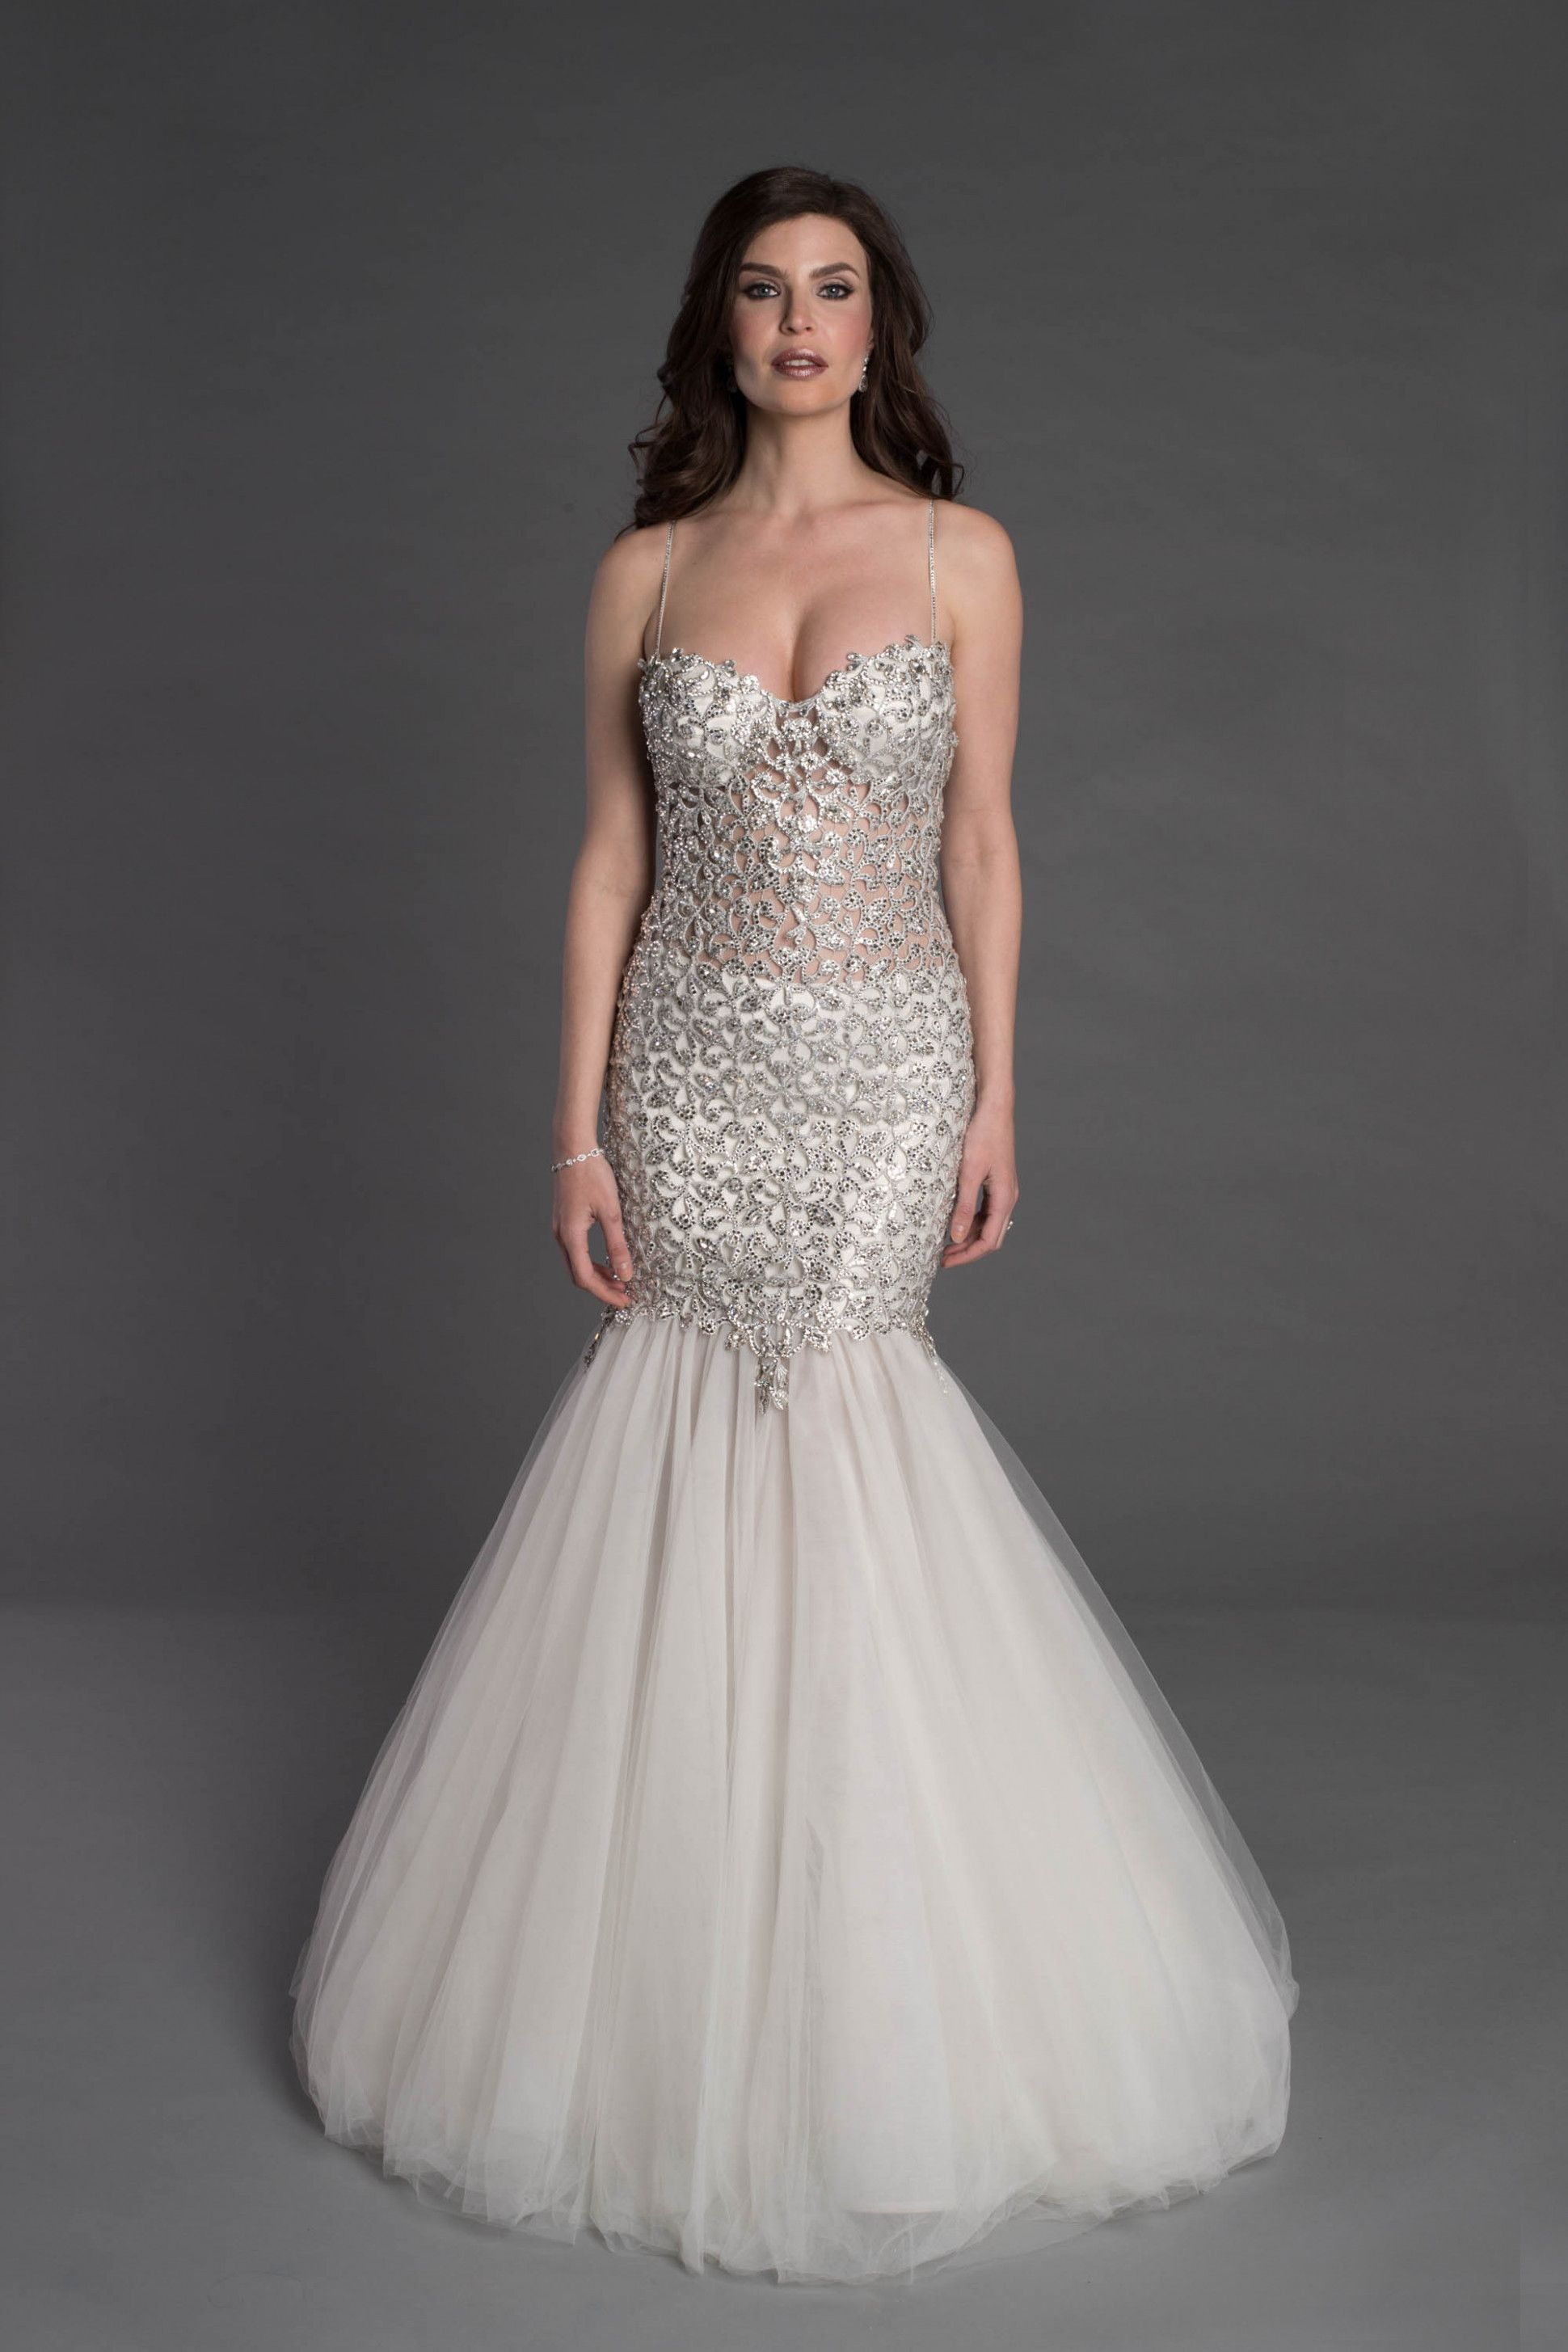 Couture mermaid wedding dress kleinfeld bridal weddding dress